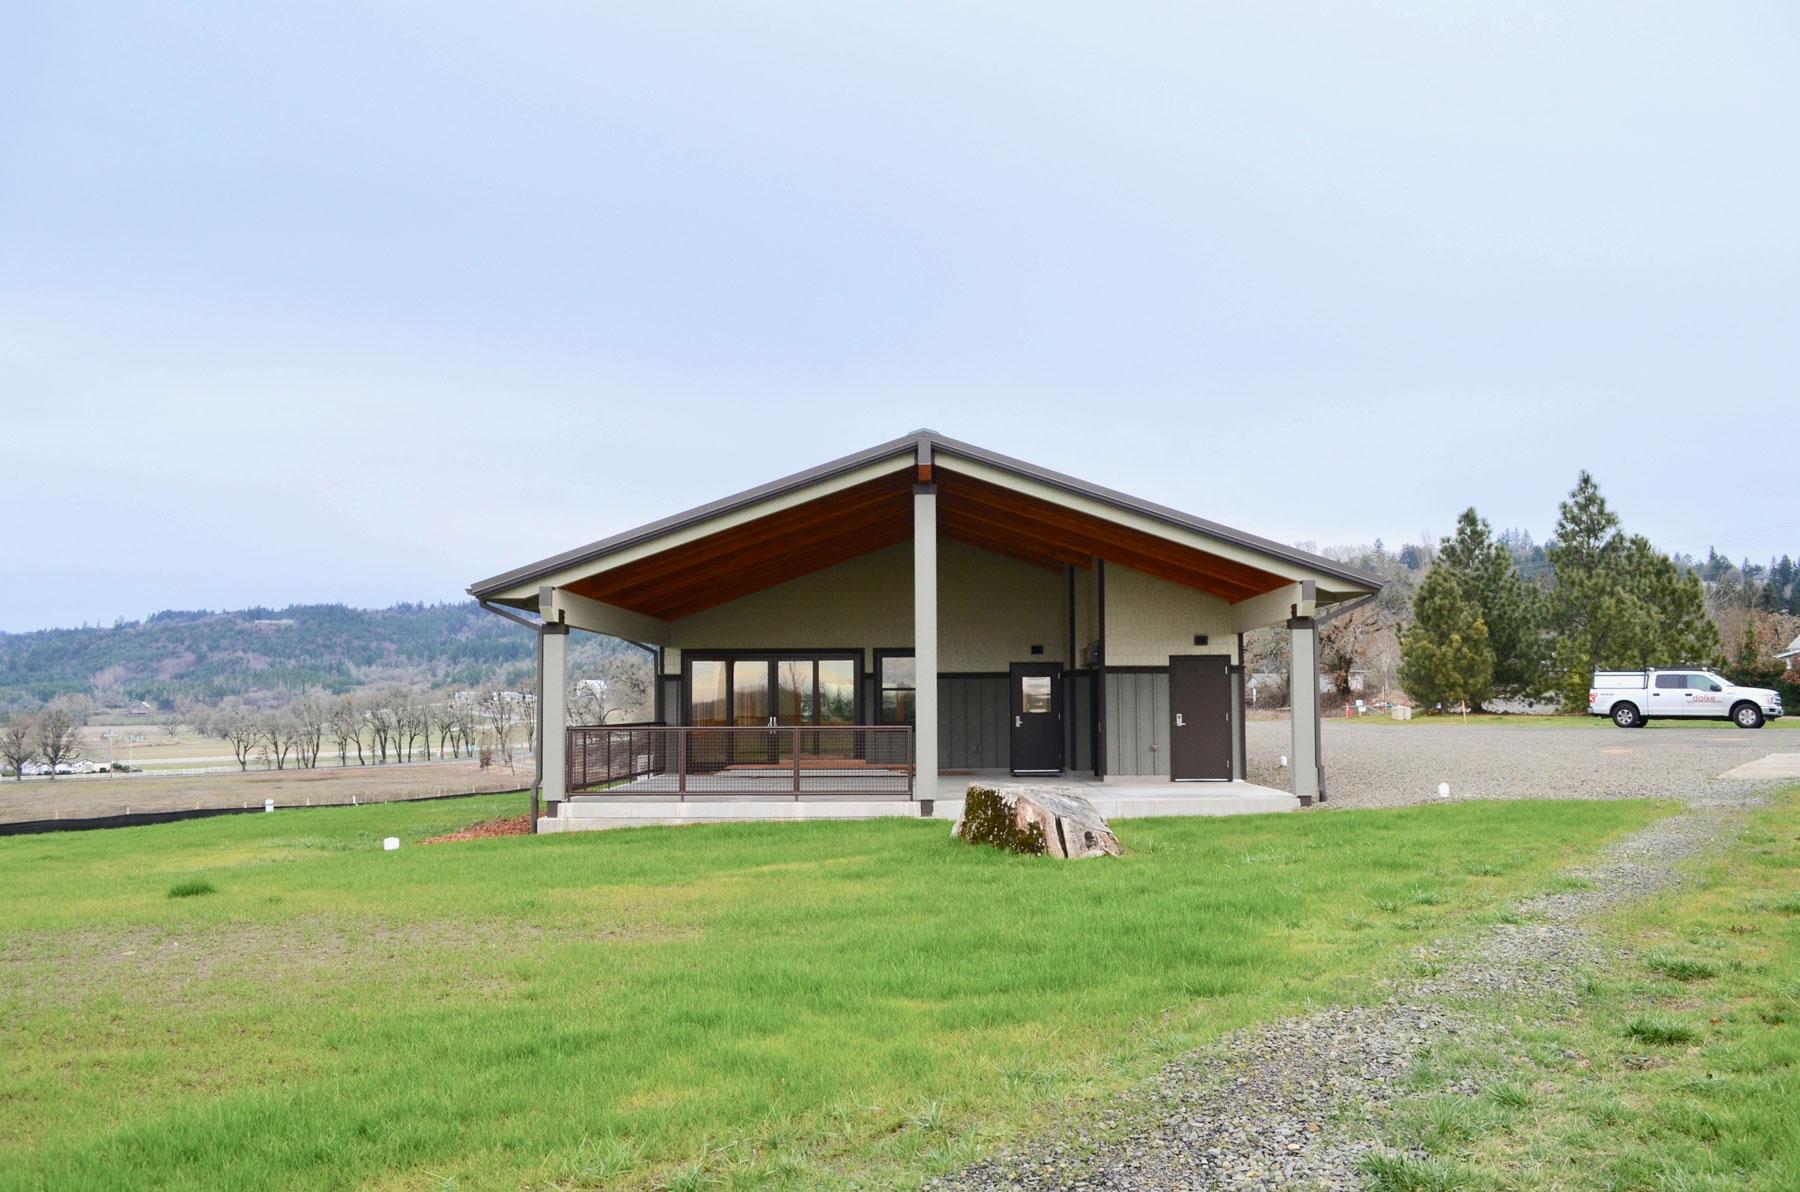 Ankeny Nature Center